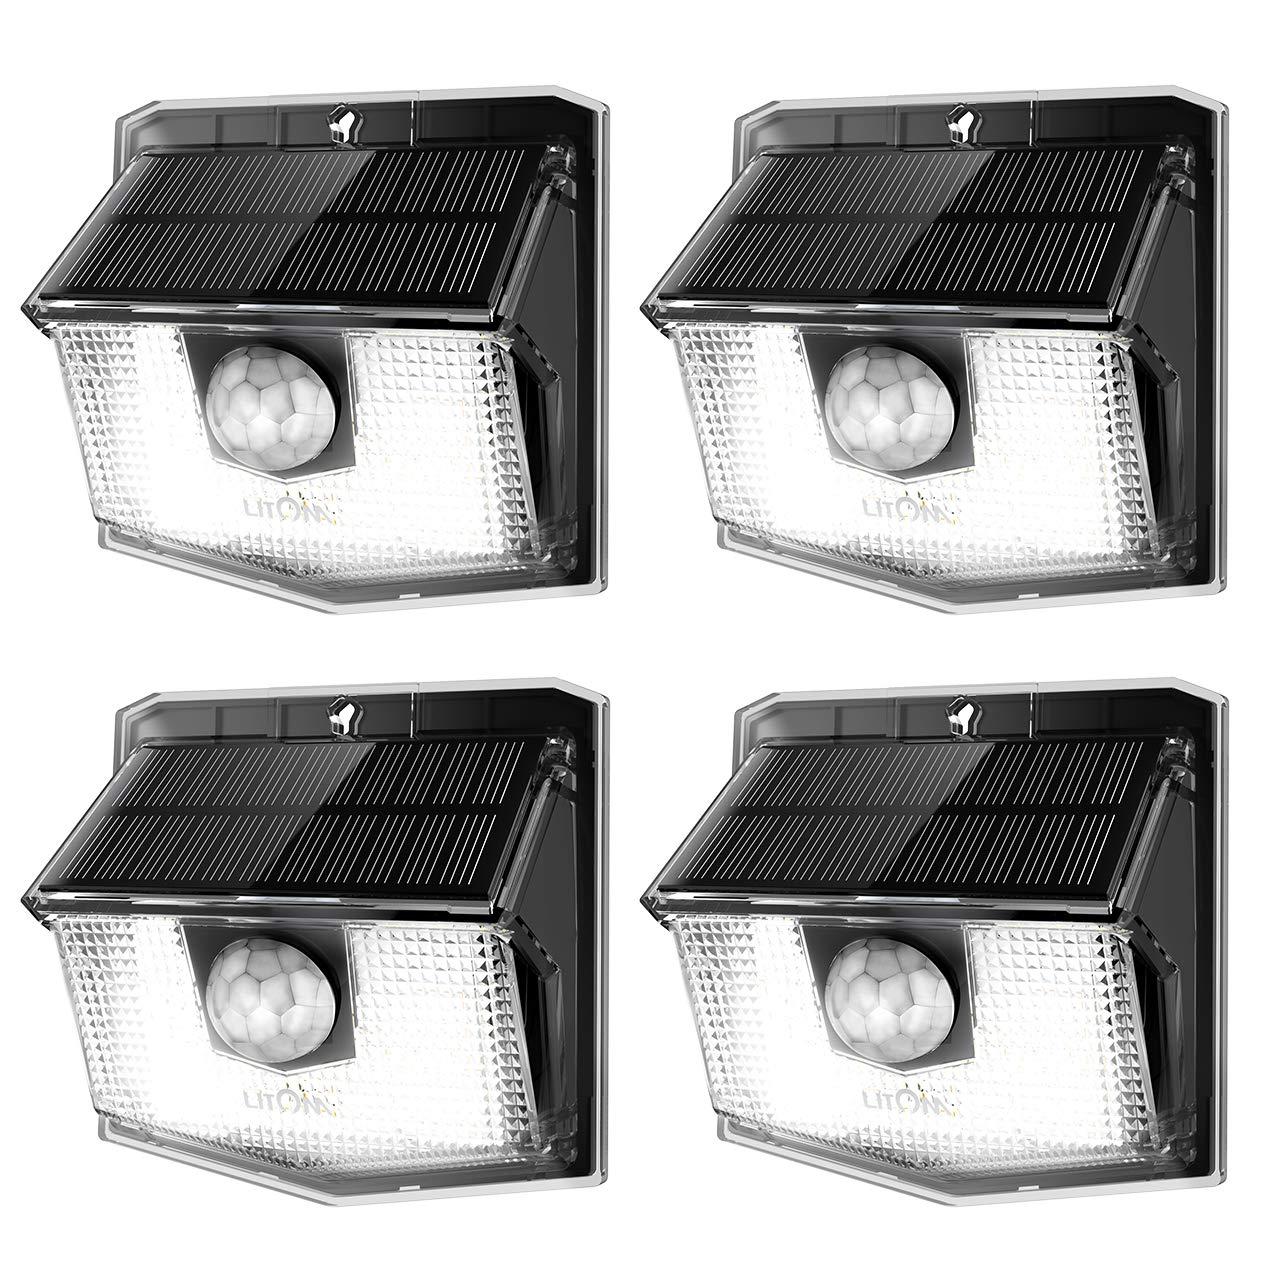 Litom Lite 30 Led Solar Lights Outdoor Wireless Easy To